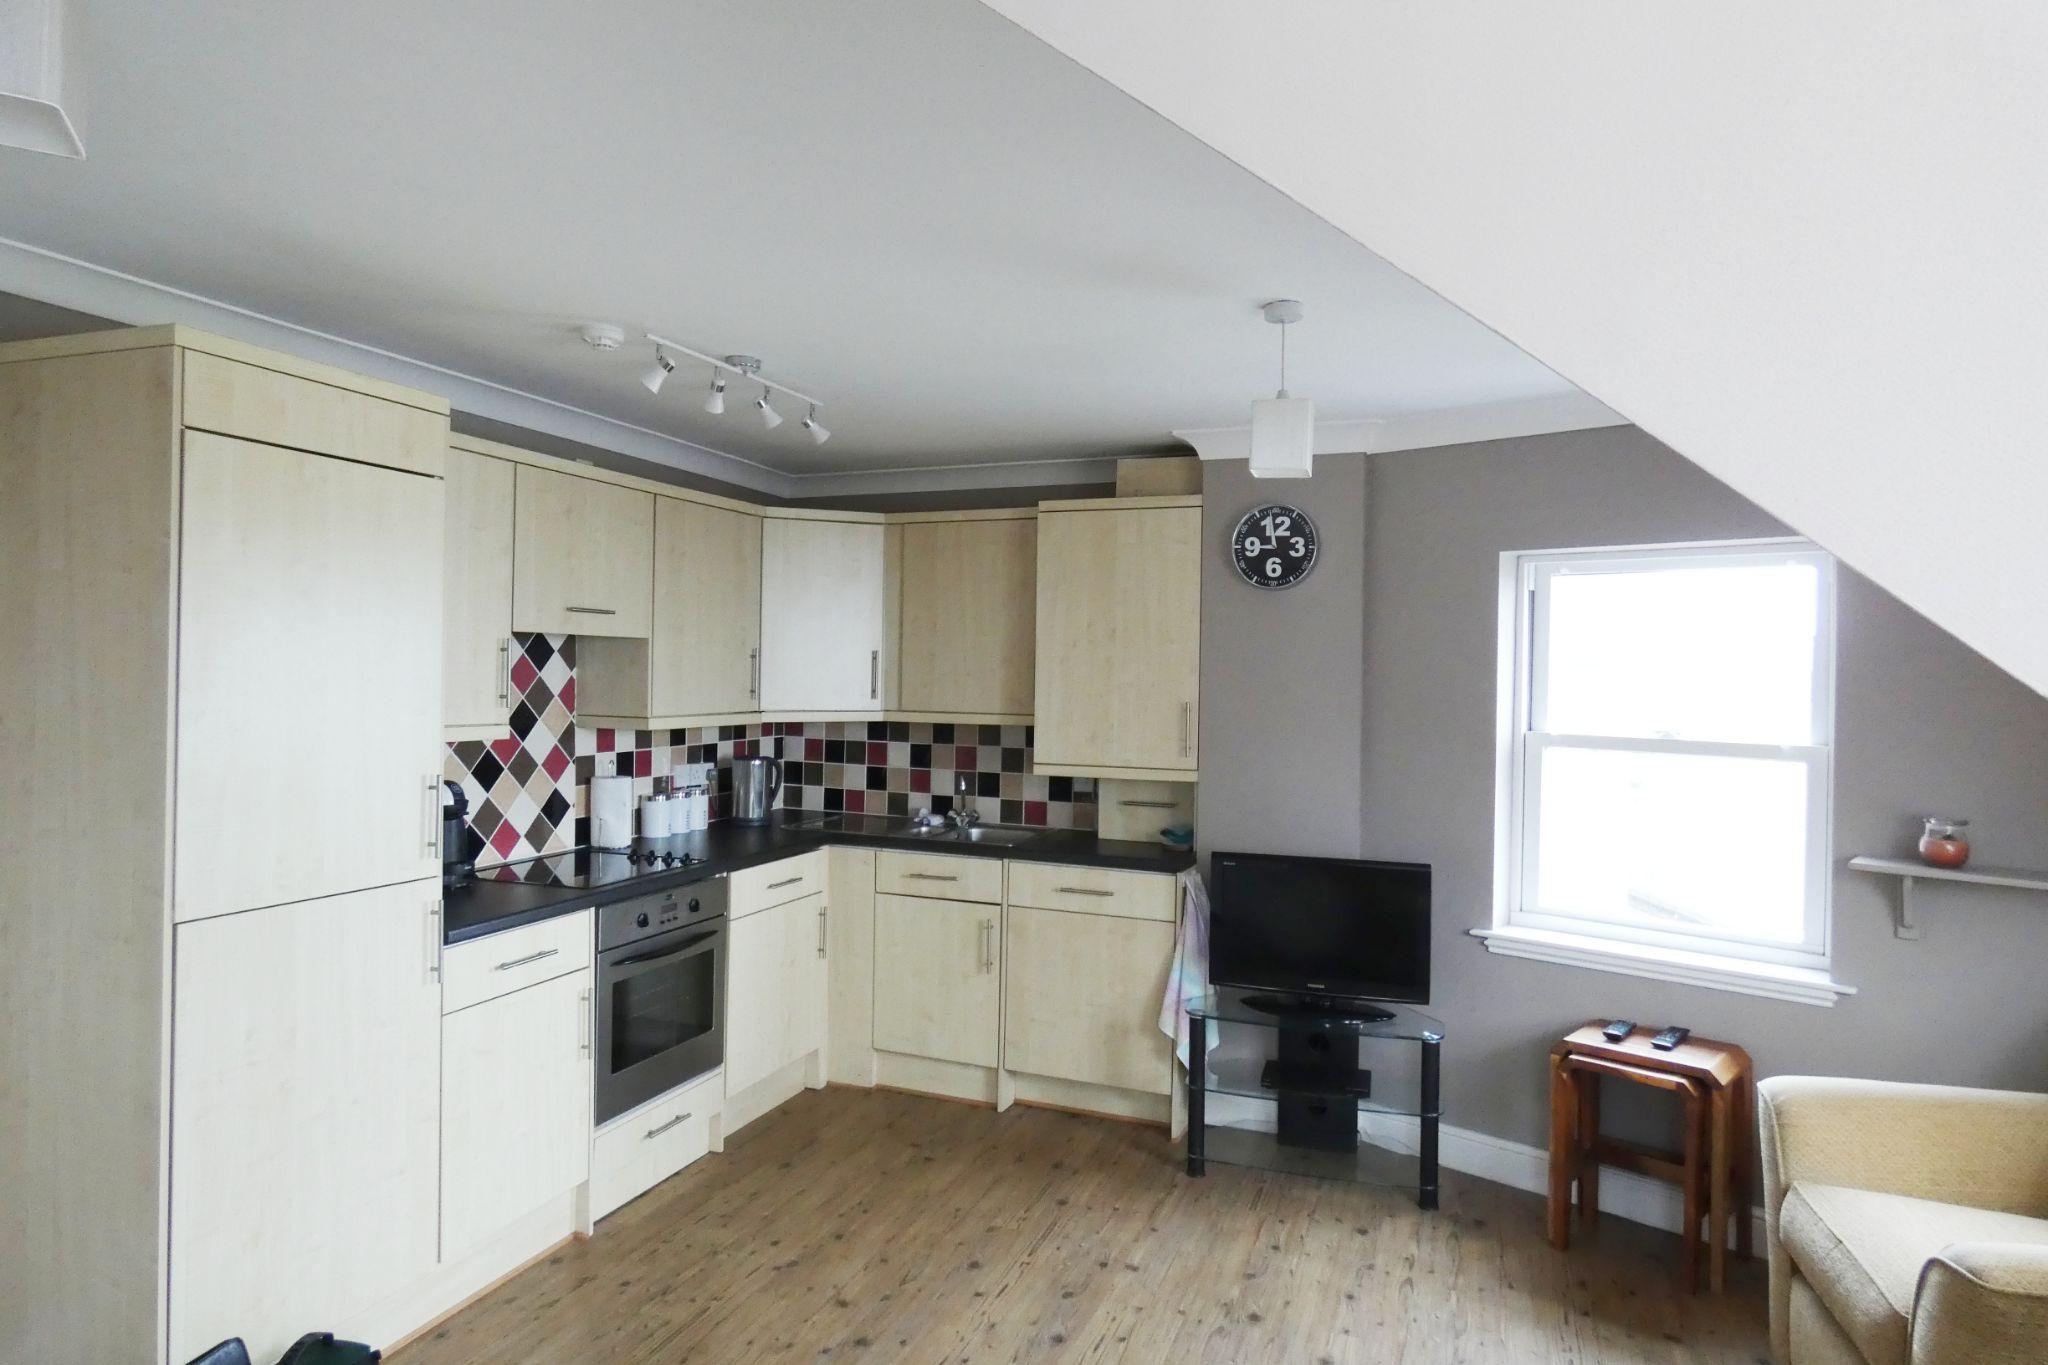 1 bedroom apartment flat/apartment SSTC in Peel - Photograph 4